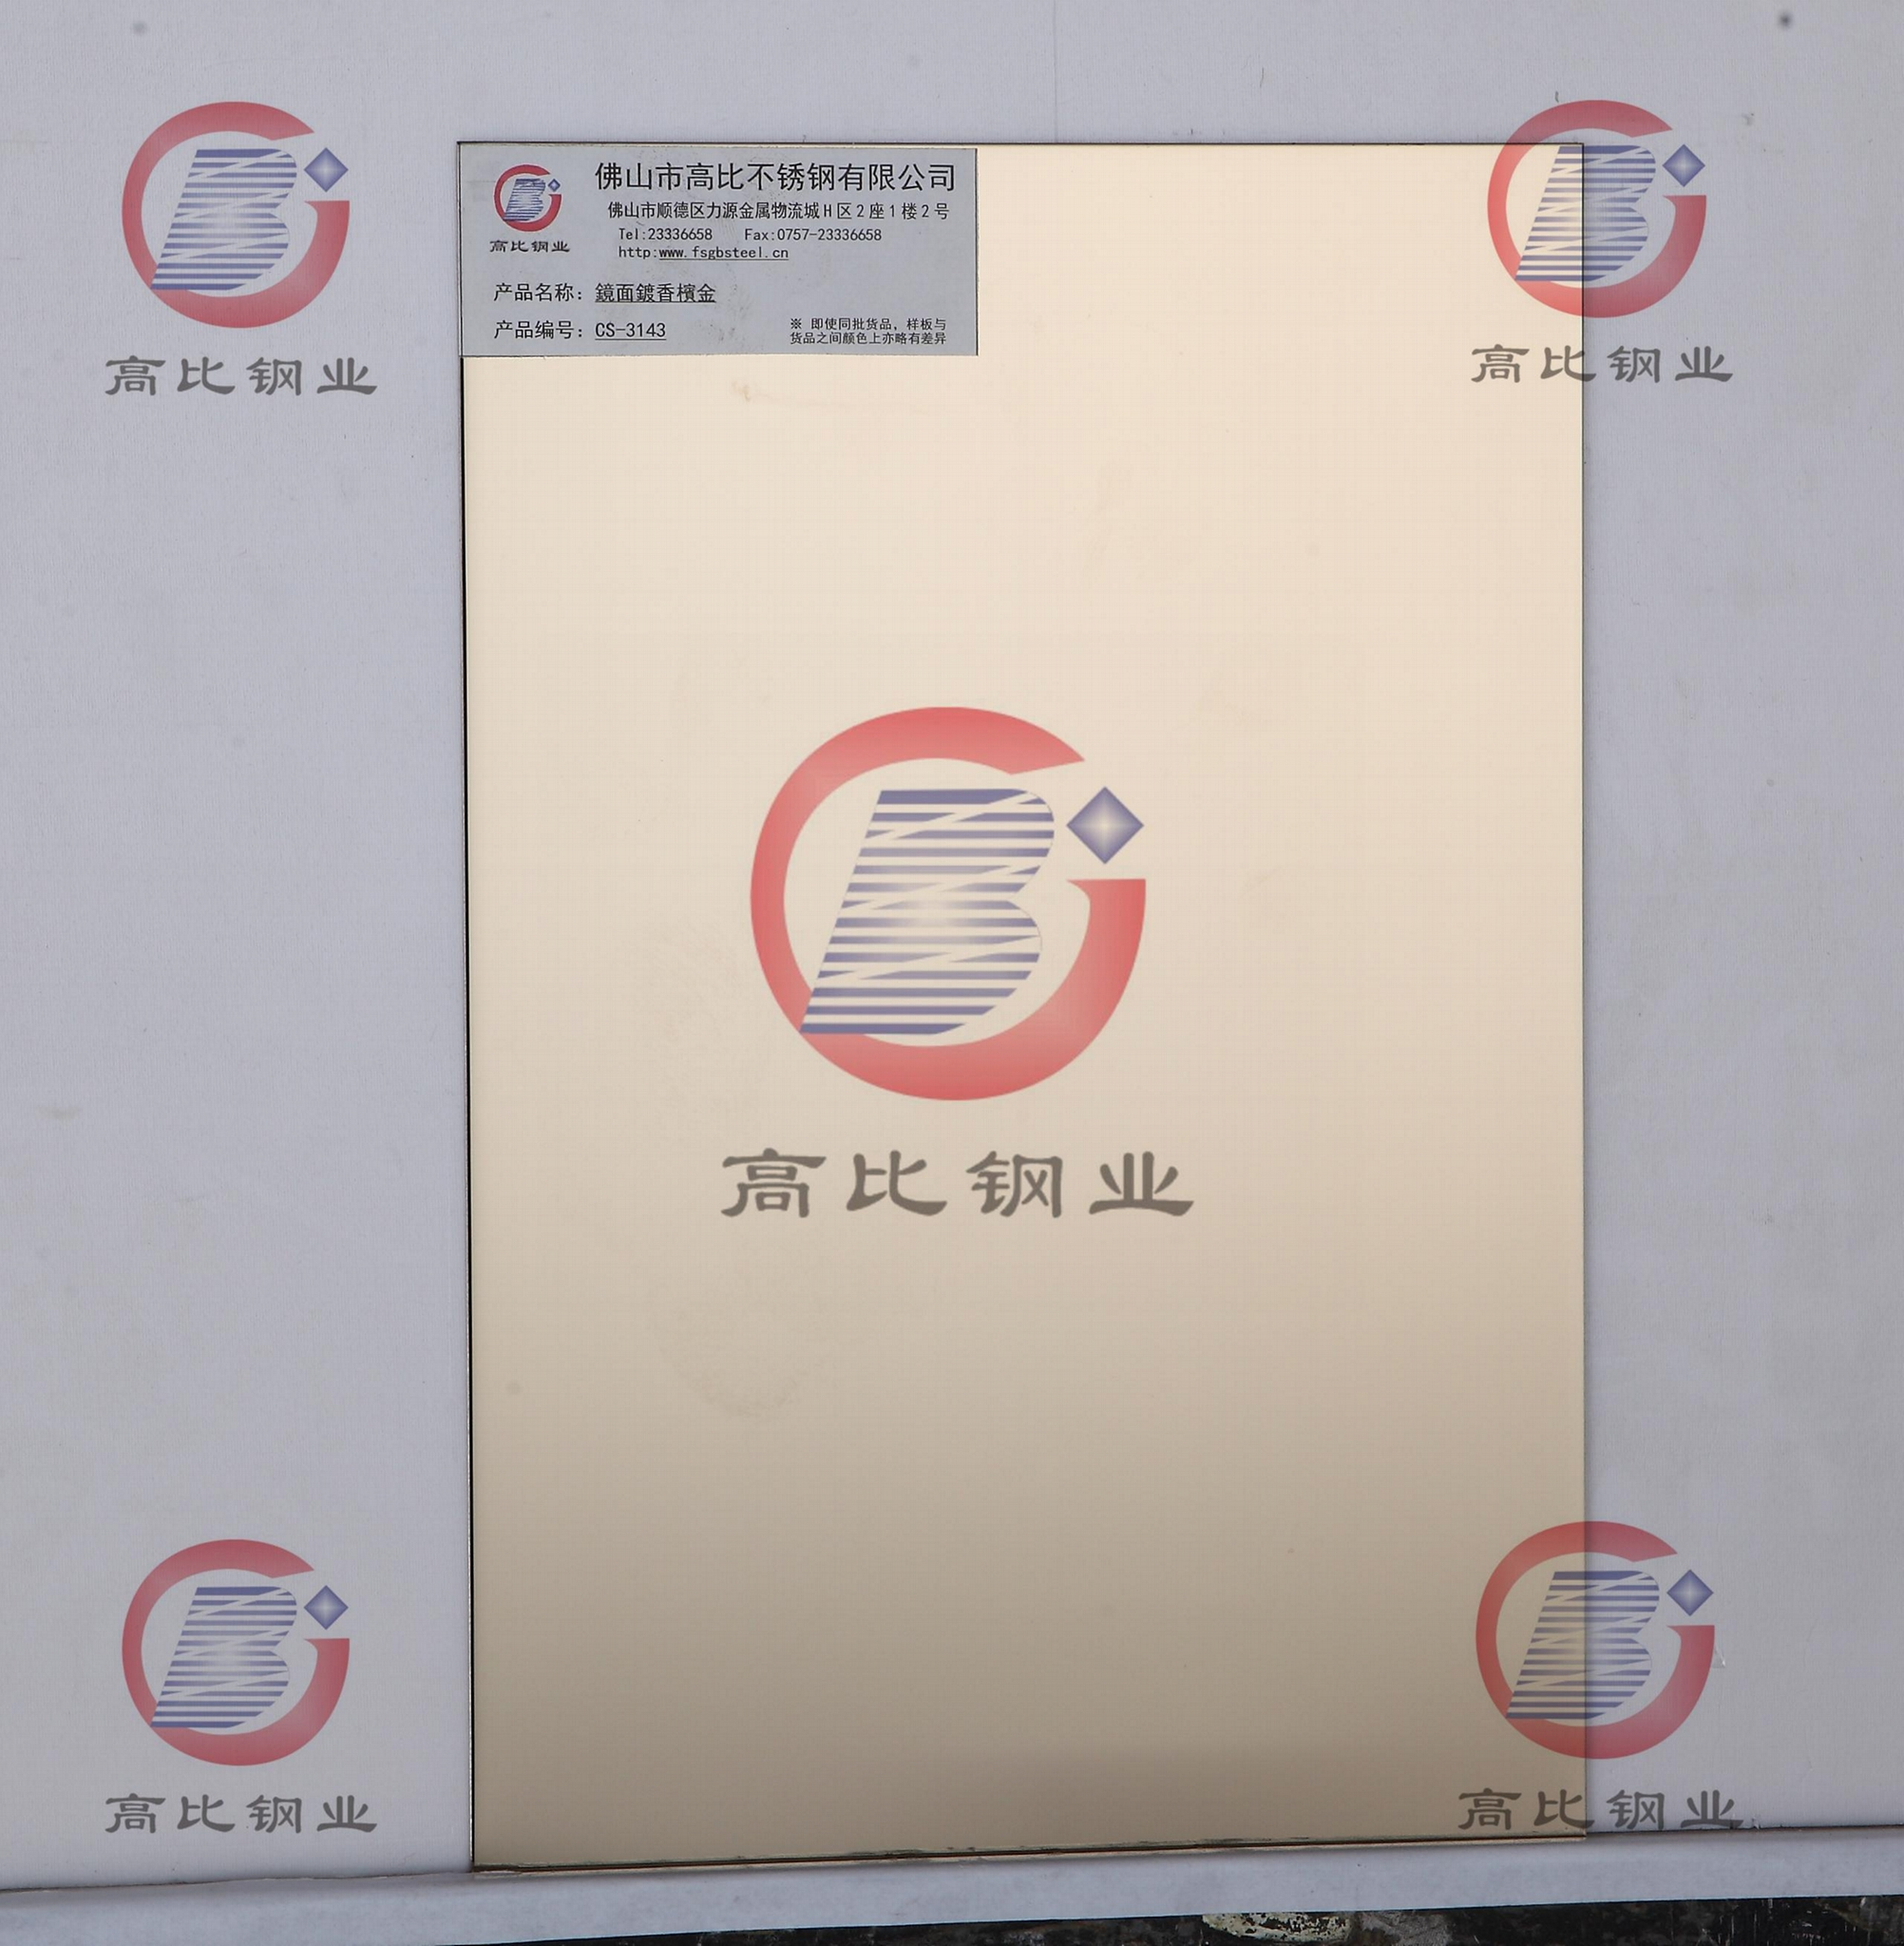 CS-3143 高比鏡面香檳金不鏽鋼板 家居金屬制品裝飾材料 1